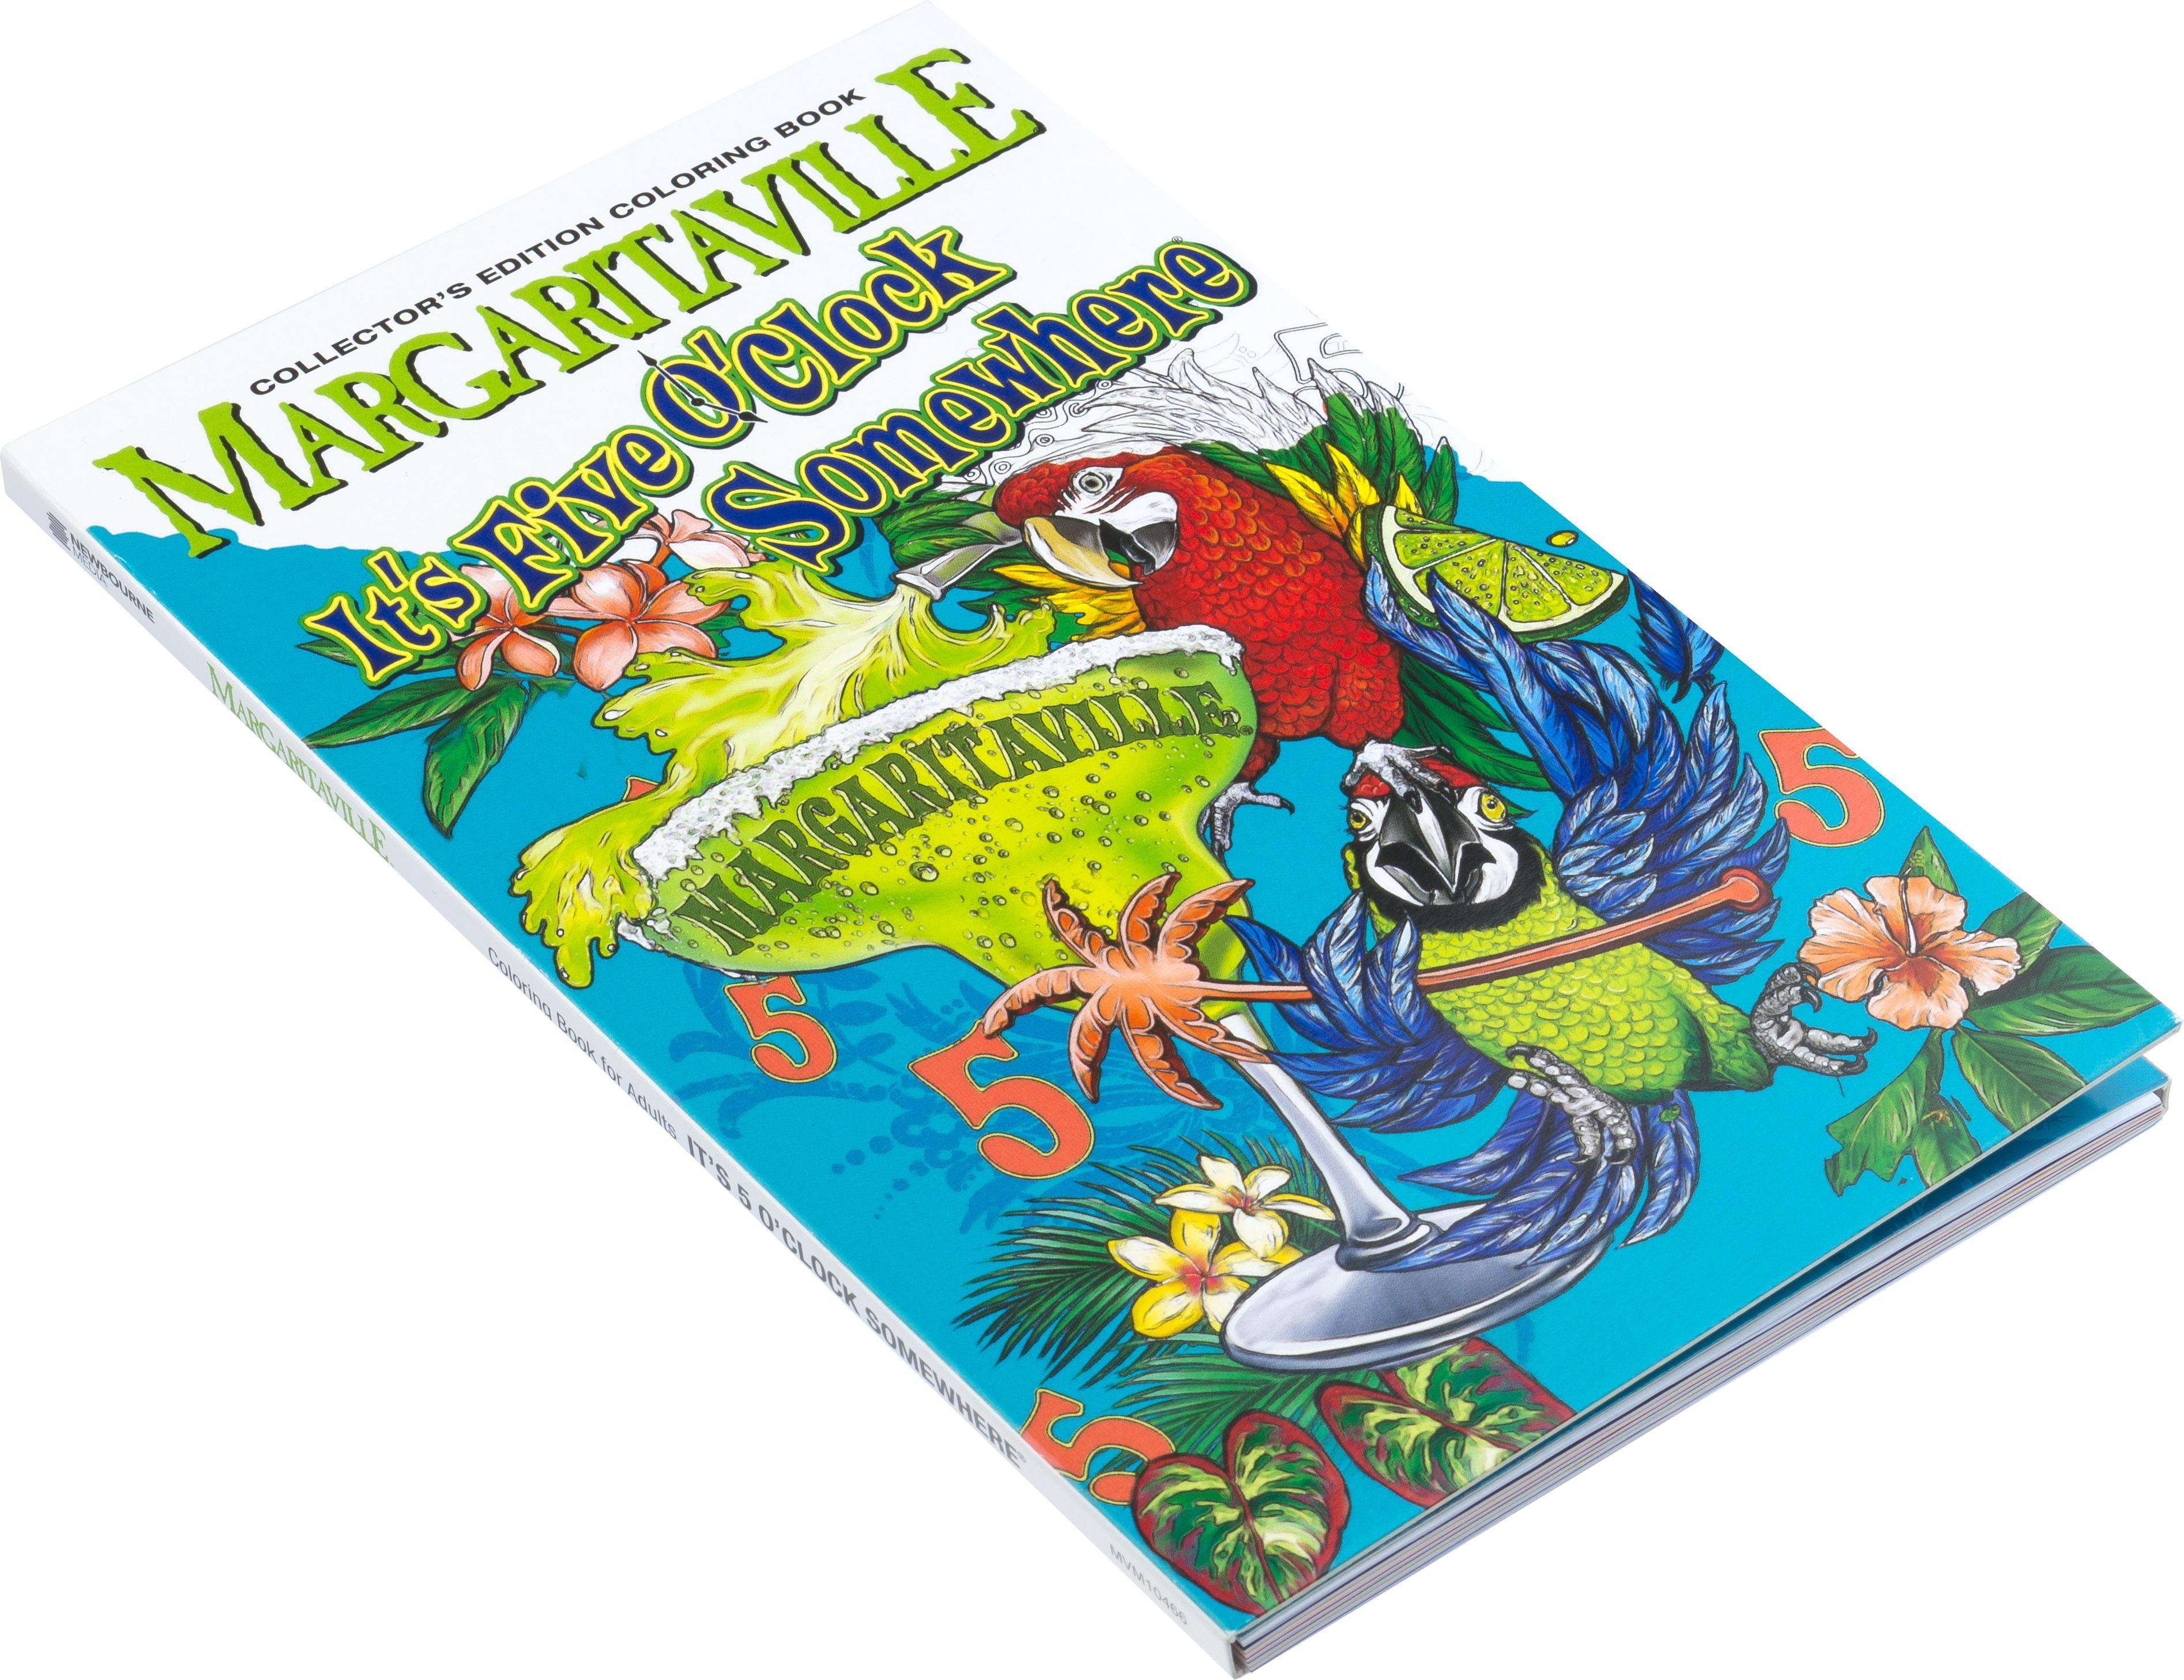 Amazon.com: Margaritaville 5 O\'Clock Somewhere Adult Coloring Book ...